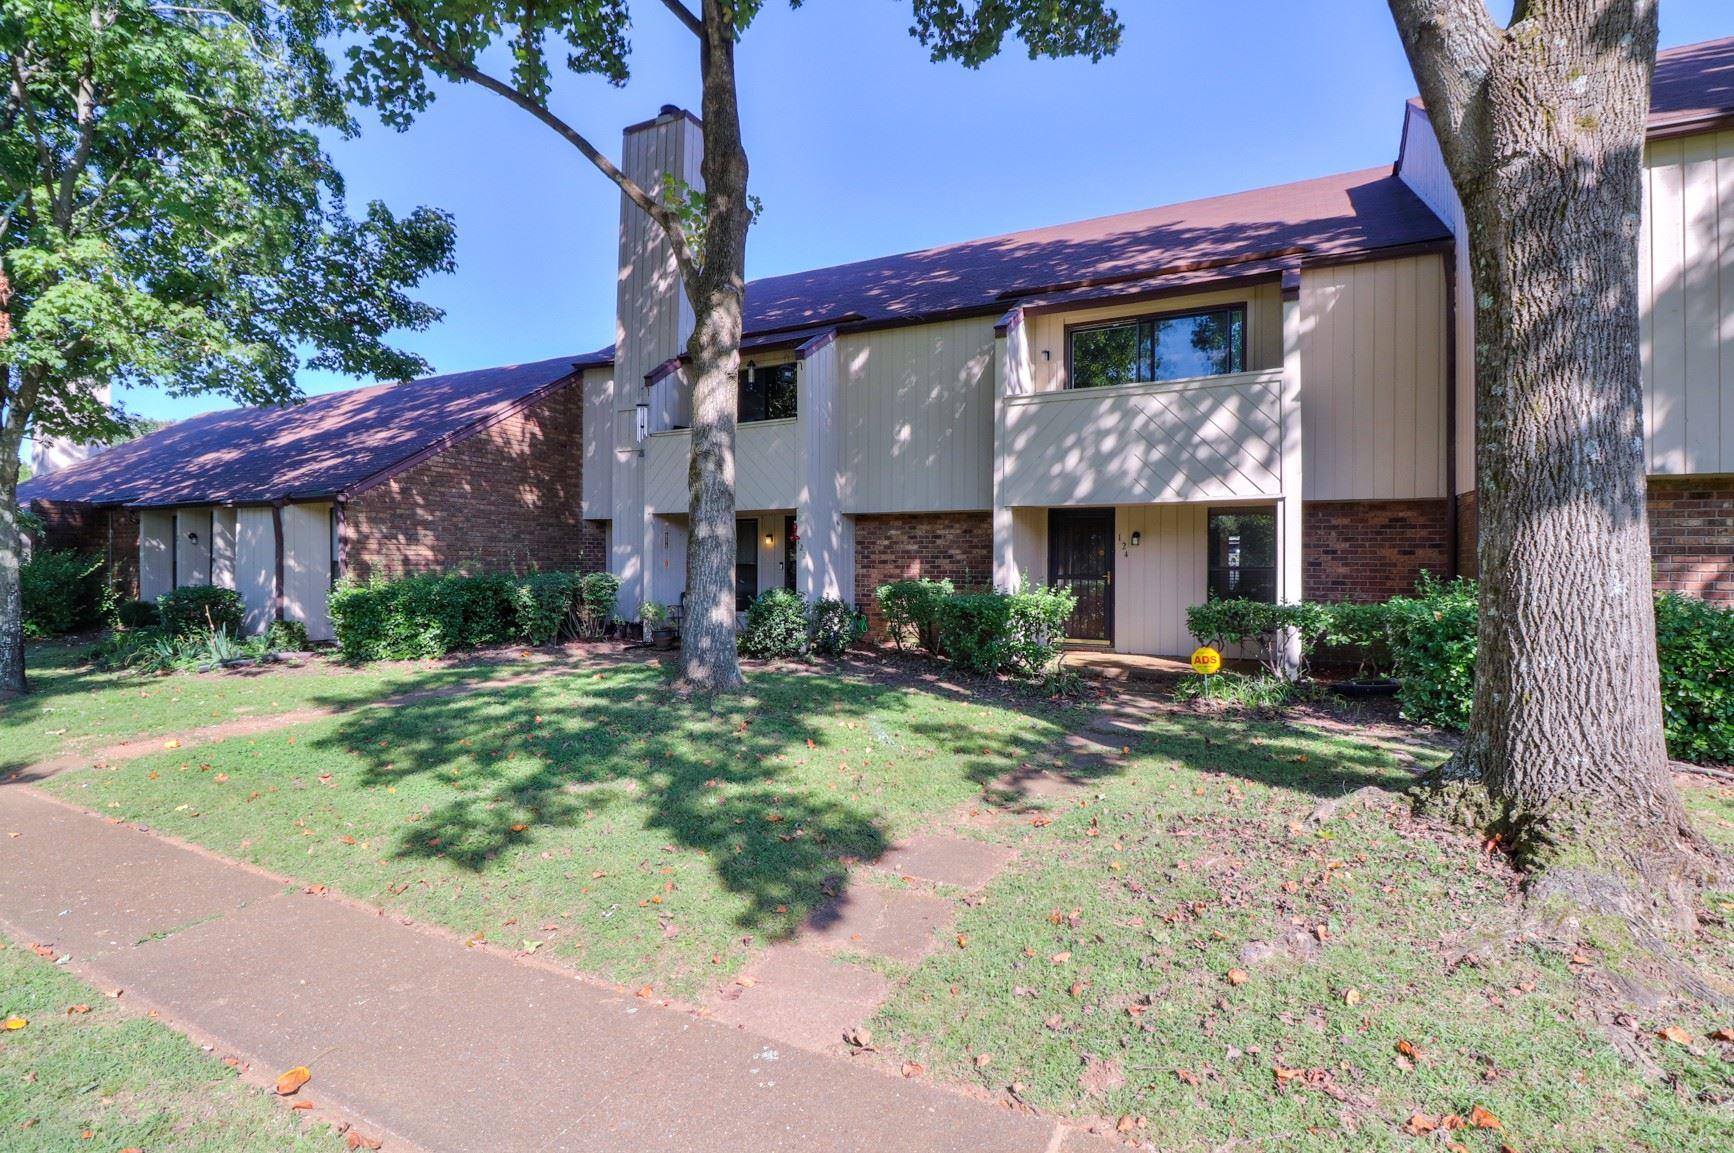 124 Saddle Tree Ct, Hermitage, TN 37076 - MLS#: 2191674